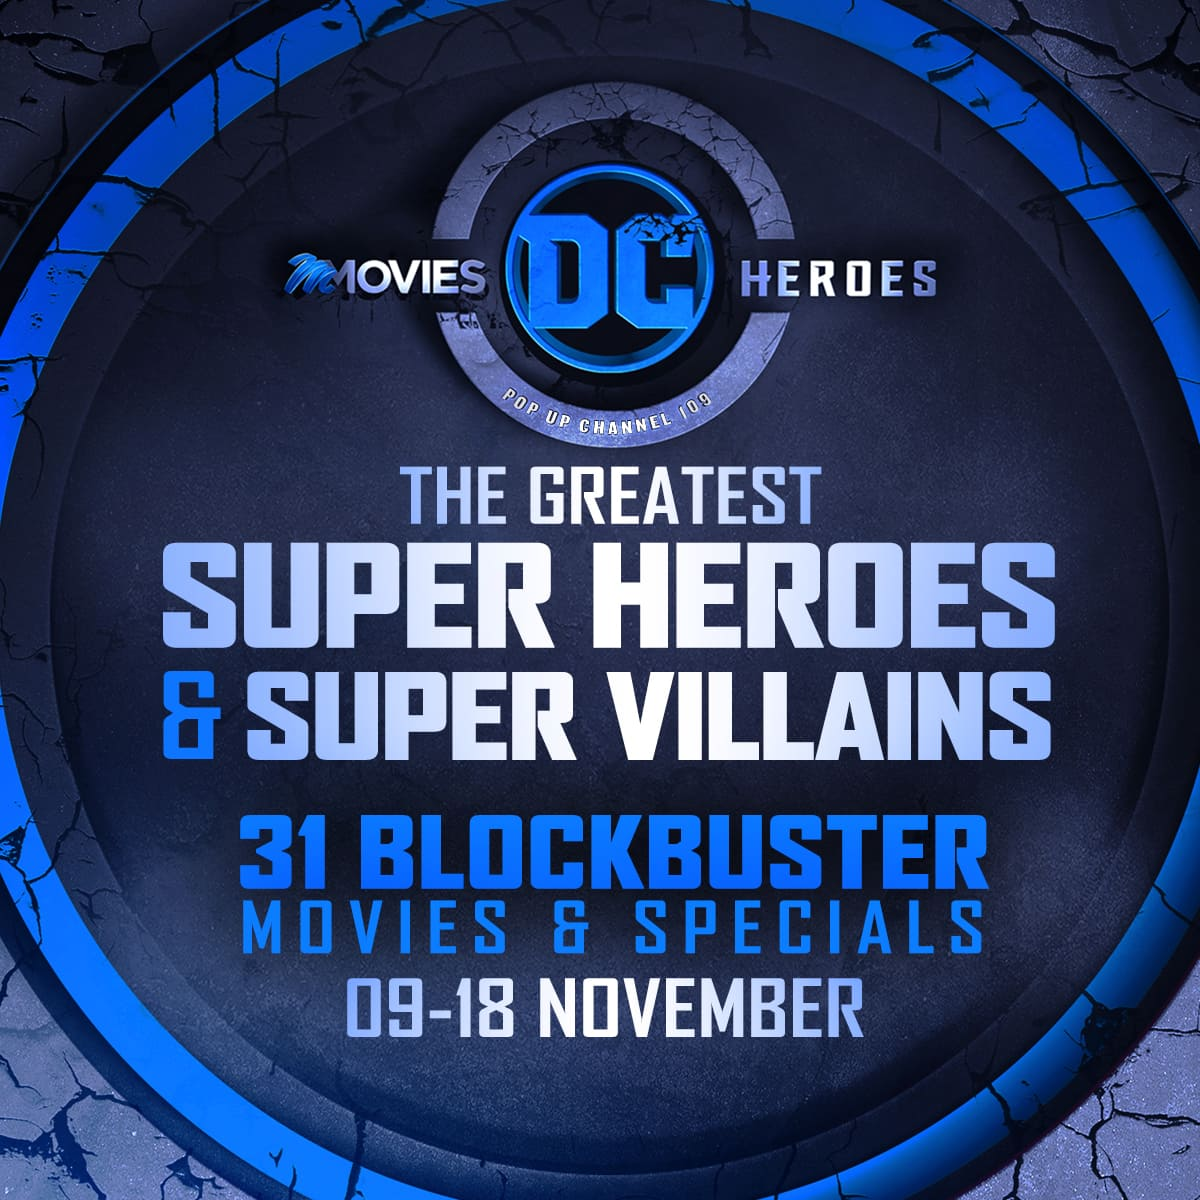 Non-stop superhero action on DStv premium